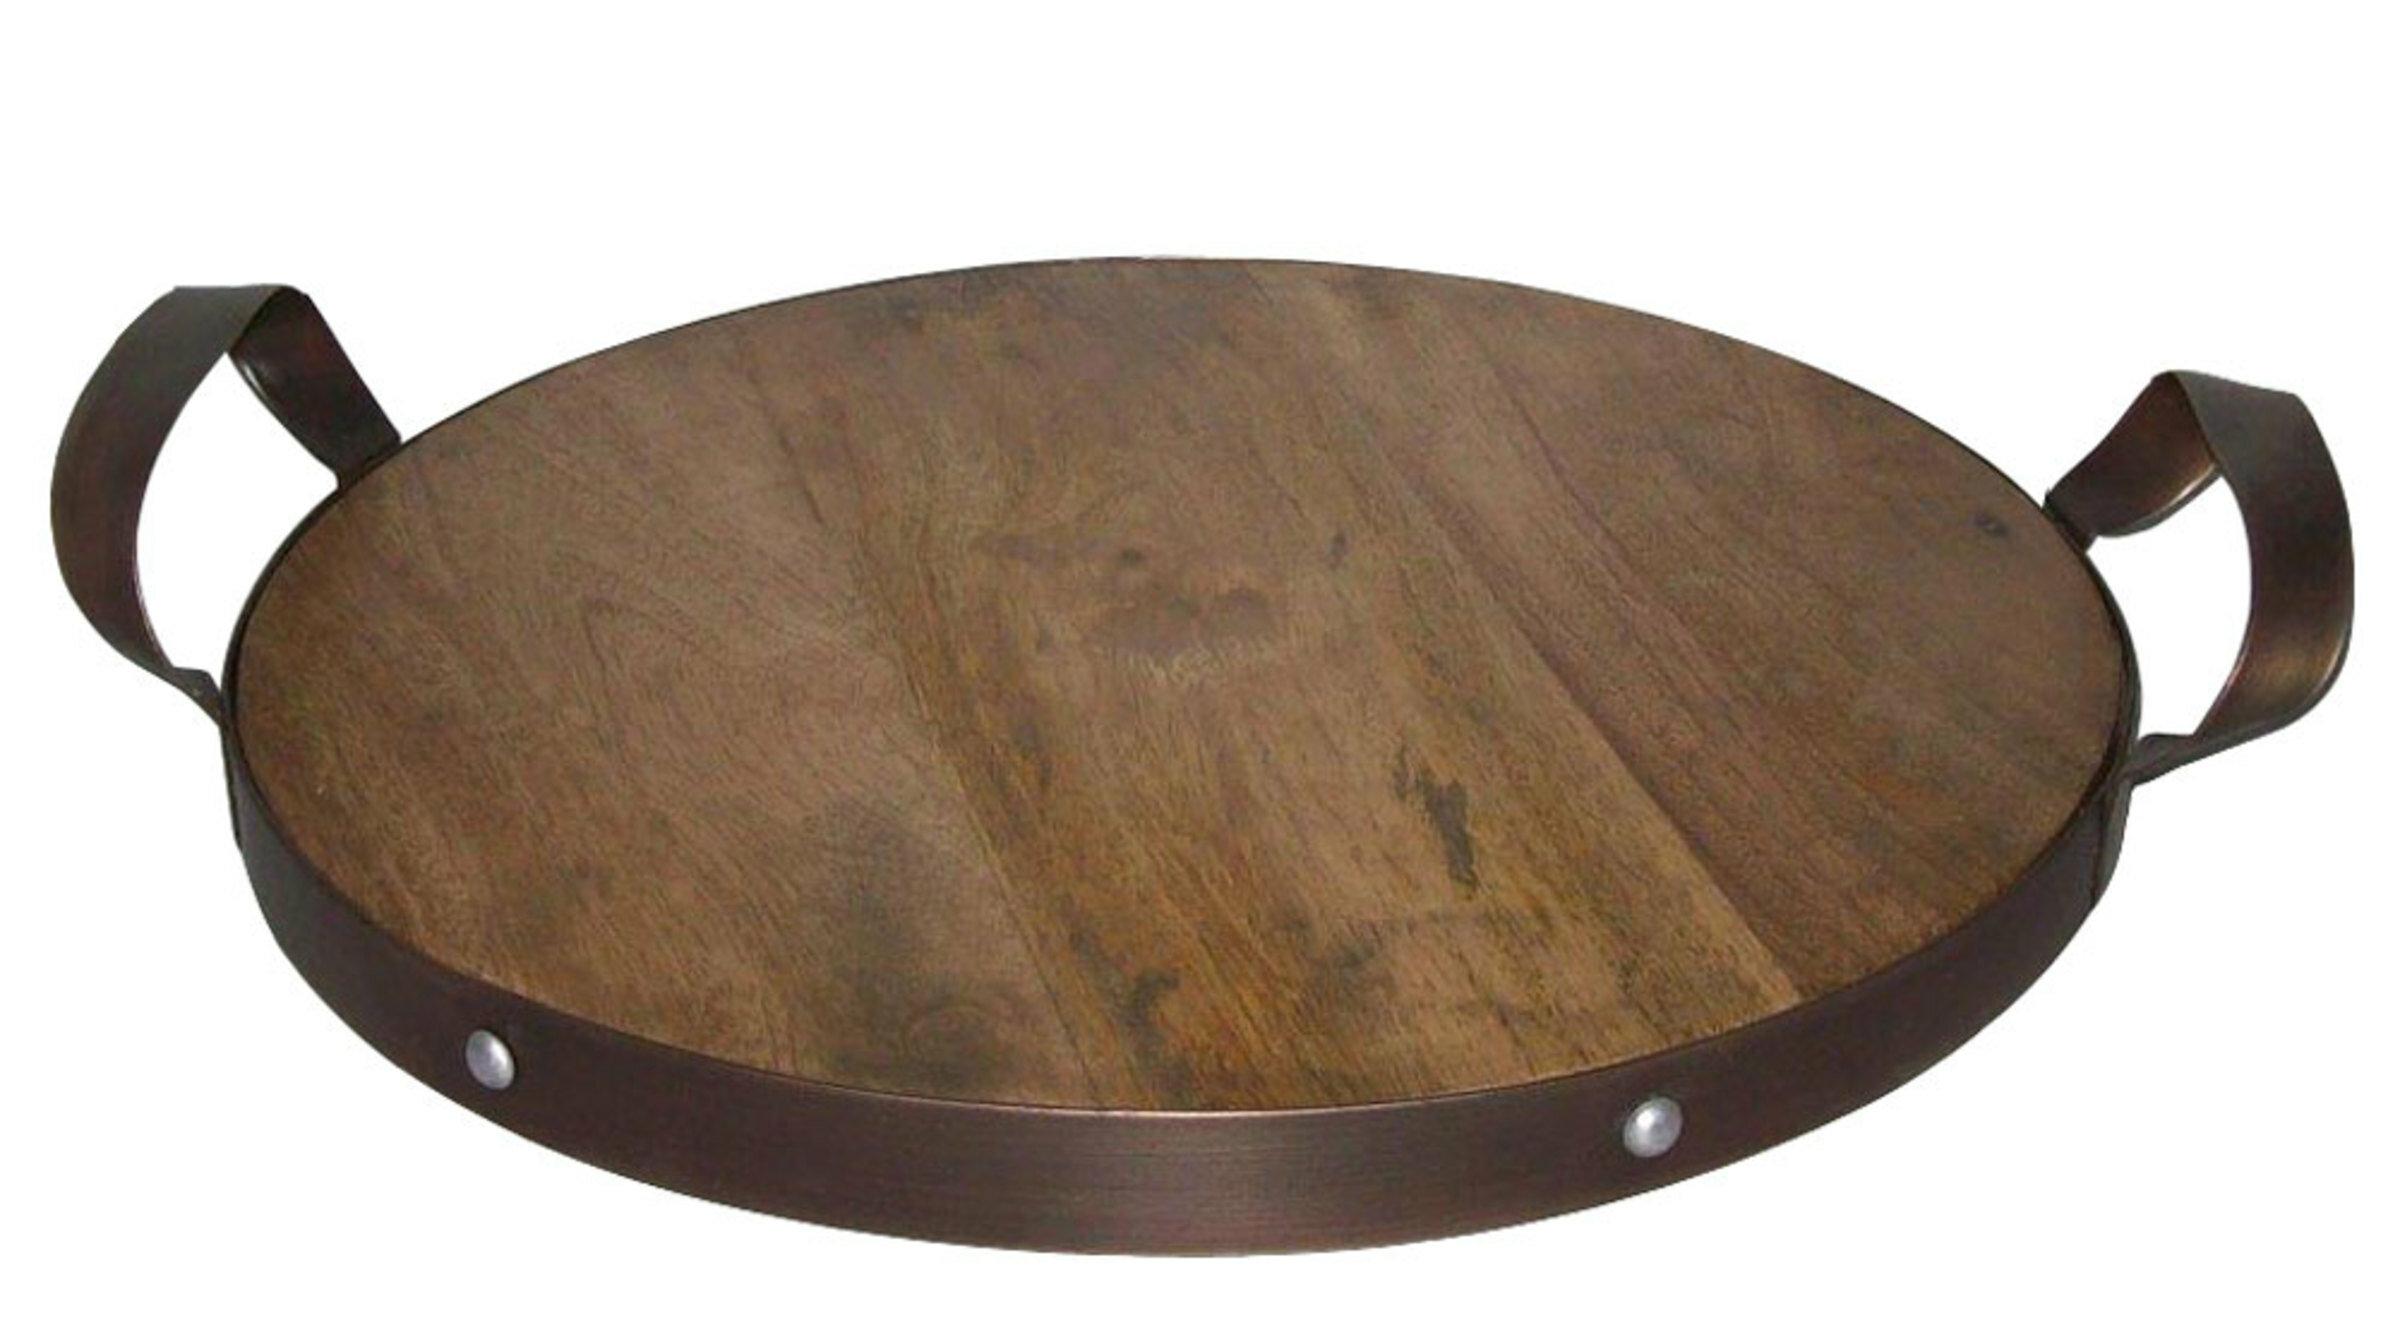 Awesome Pfaltzgraff Ottoman Tray Wayfair Inzonedesignstudio Interior Chair Design Inzonedesignstudiocom